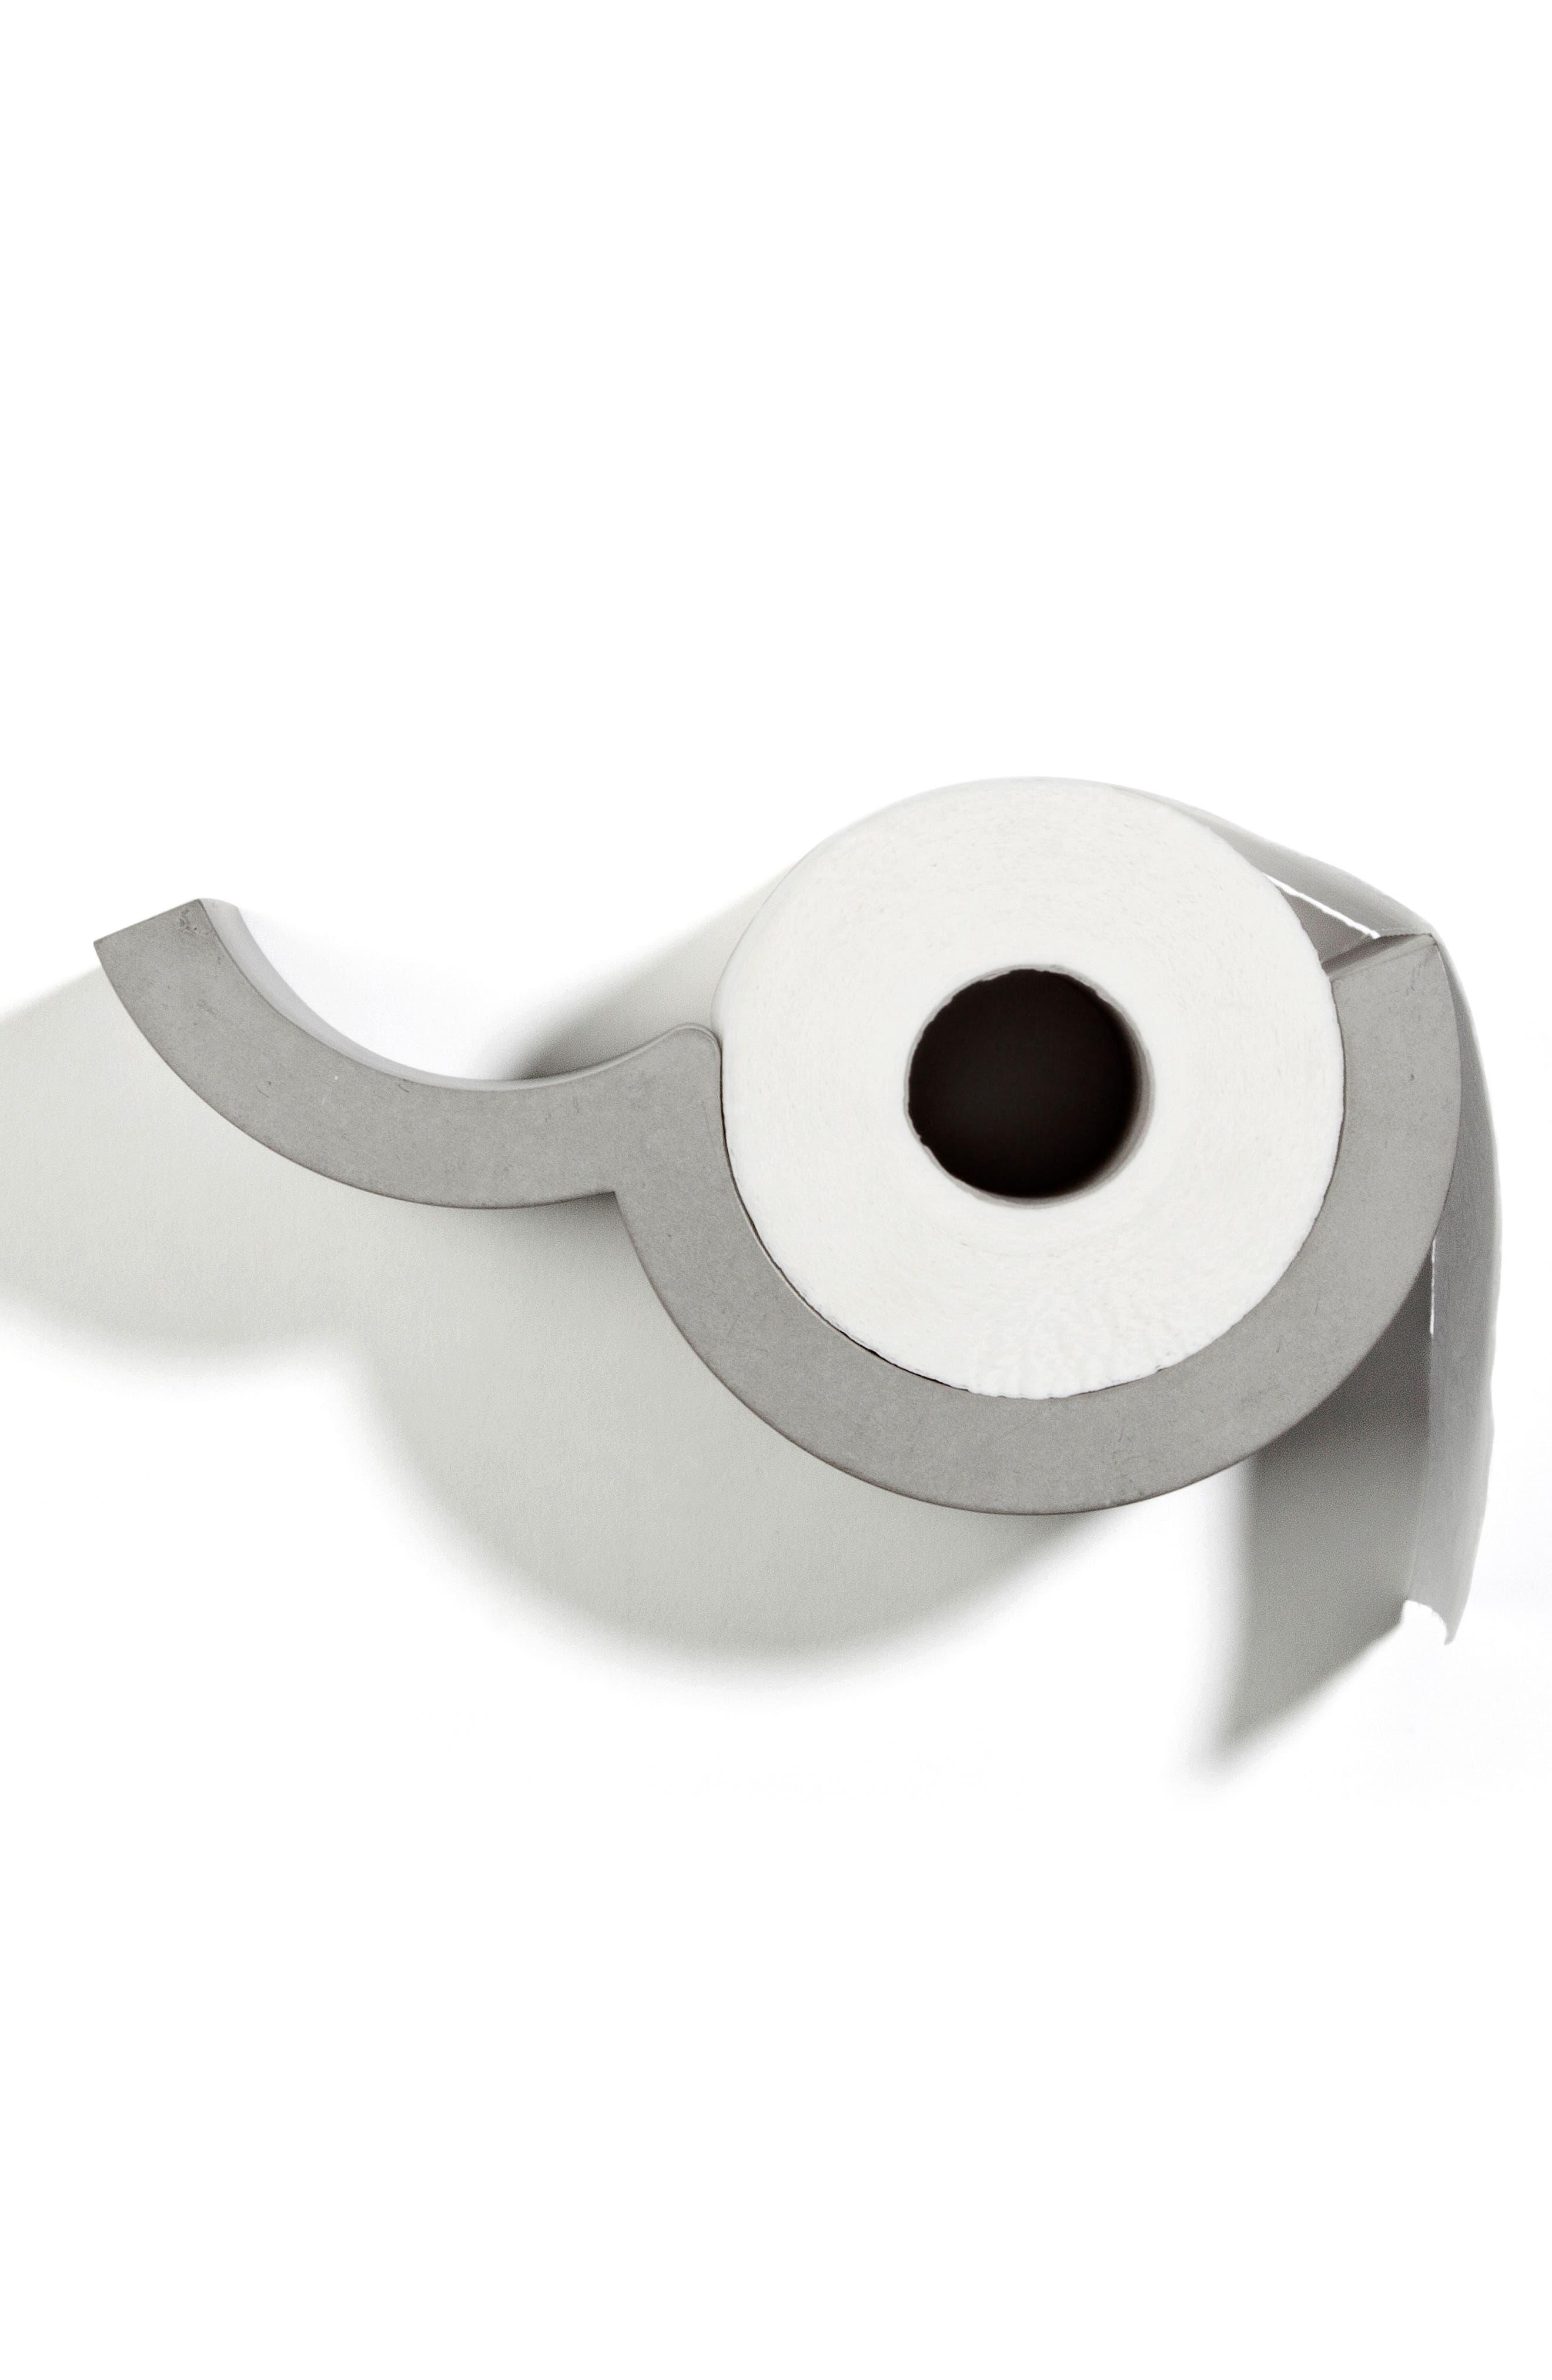 Lyon Béton Extra Small Cloud Toilet Paper Holder,                             Alternate thumbnail 5, color,                             CEMENT